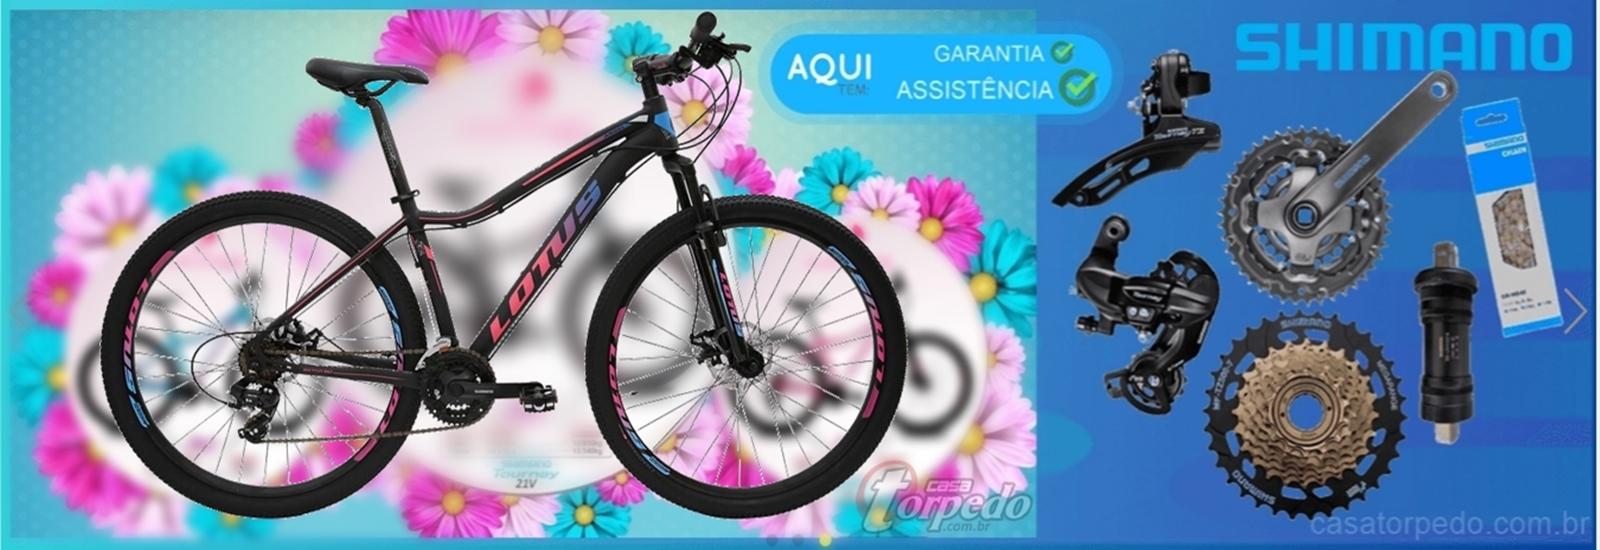 Super Preço! Bicicleta LOTUS ANGEL aro 29 - quadro garantia vitalicia